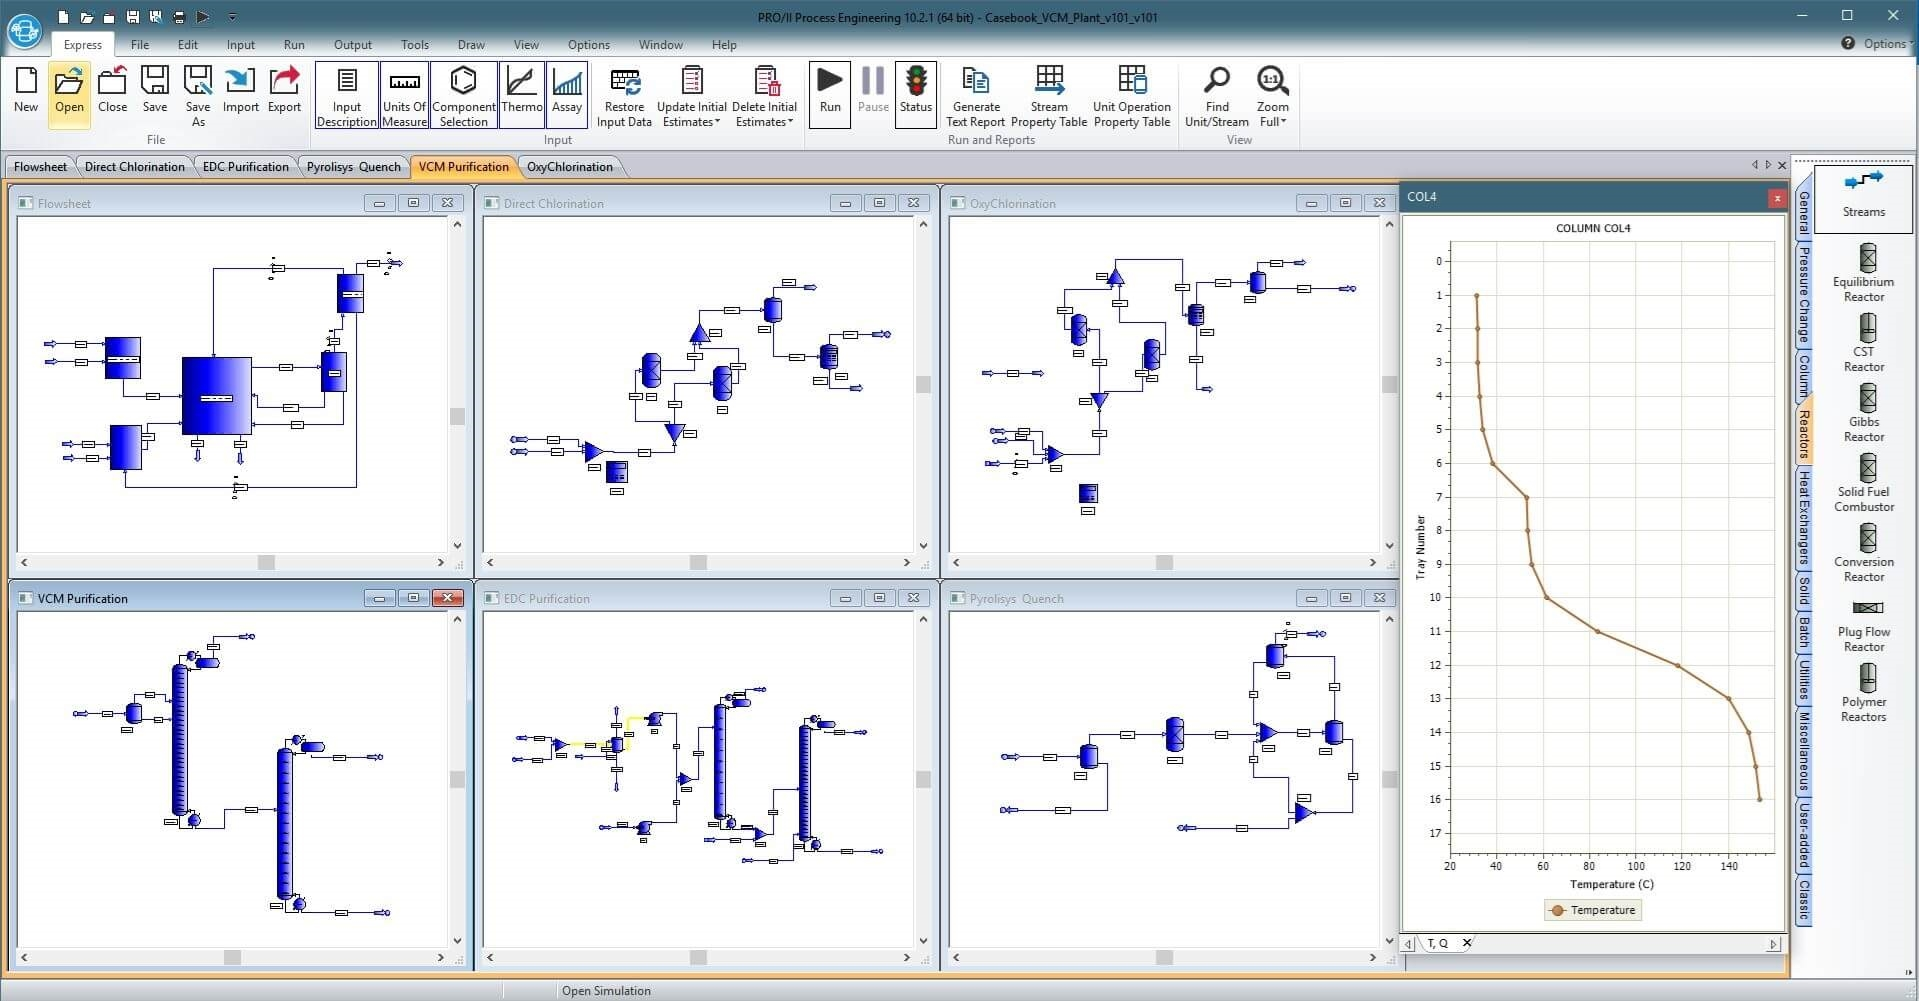 PRO/II Process Engineering